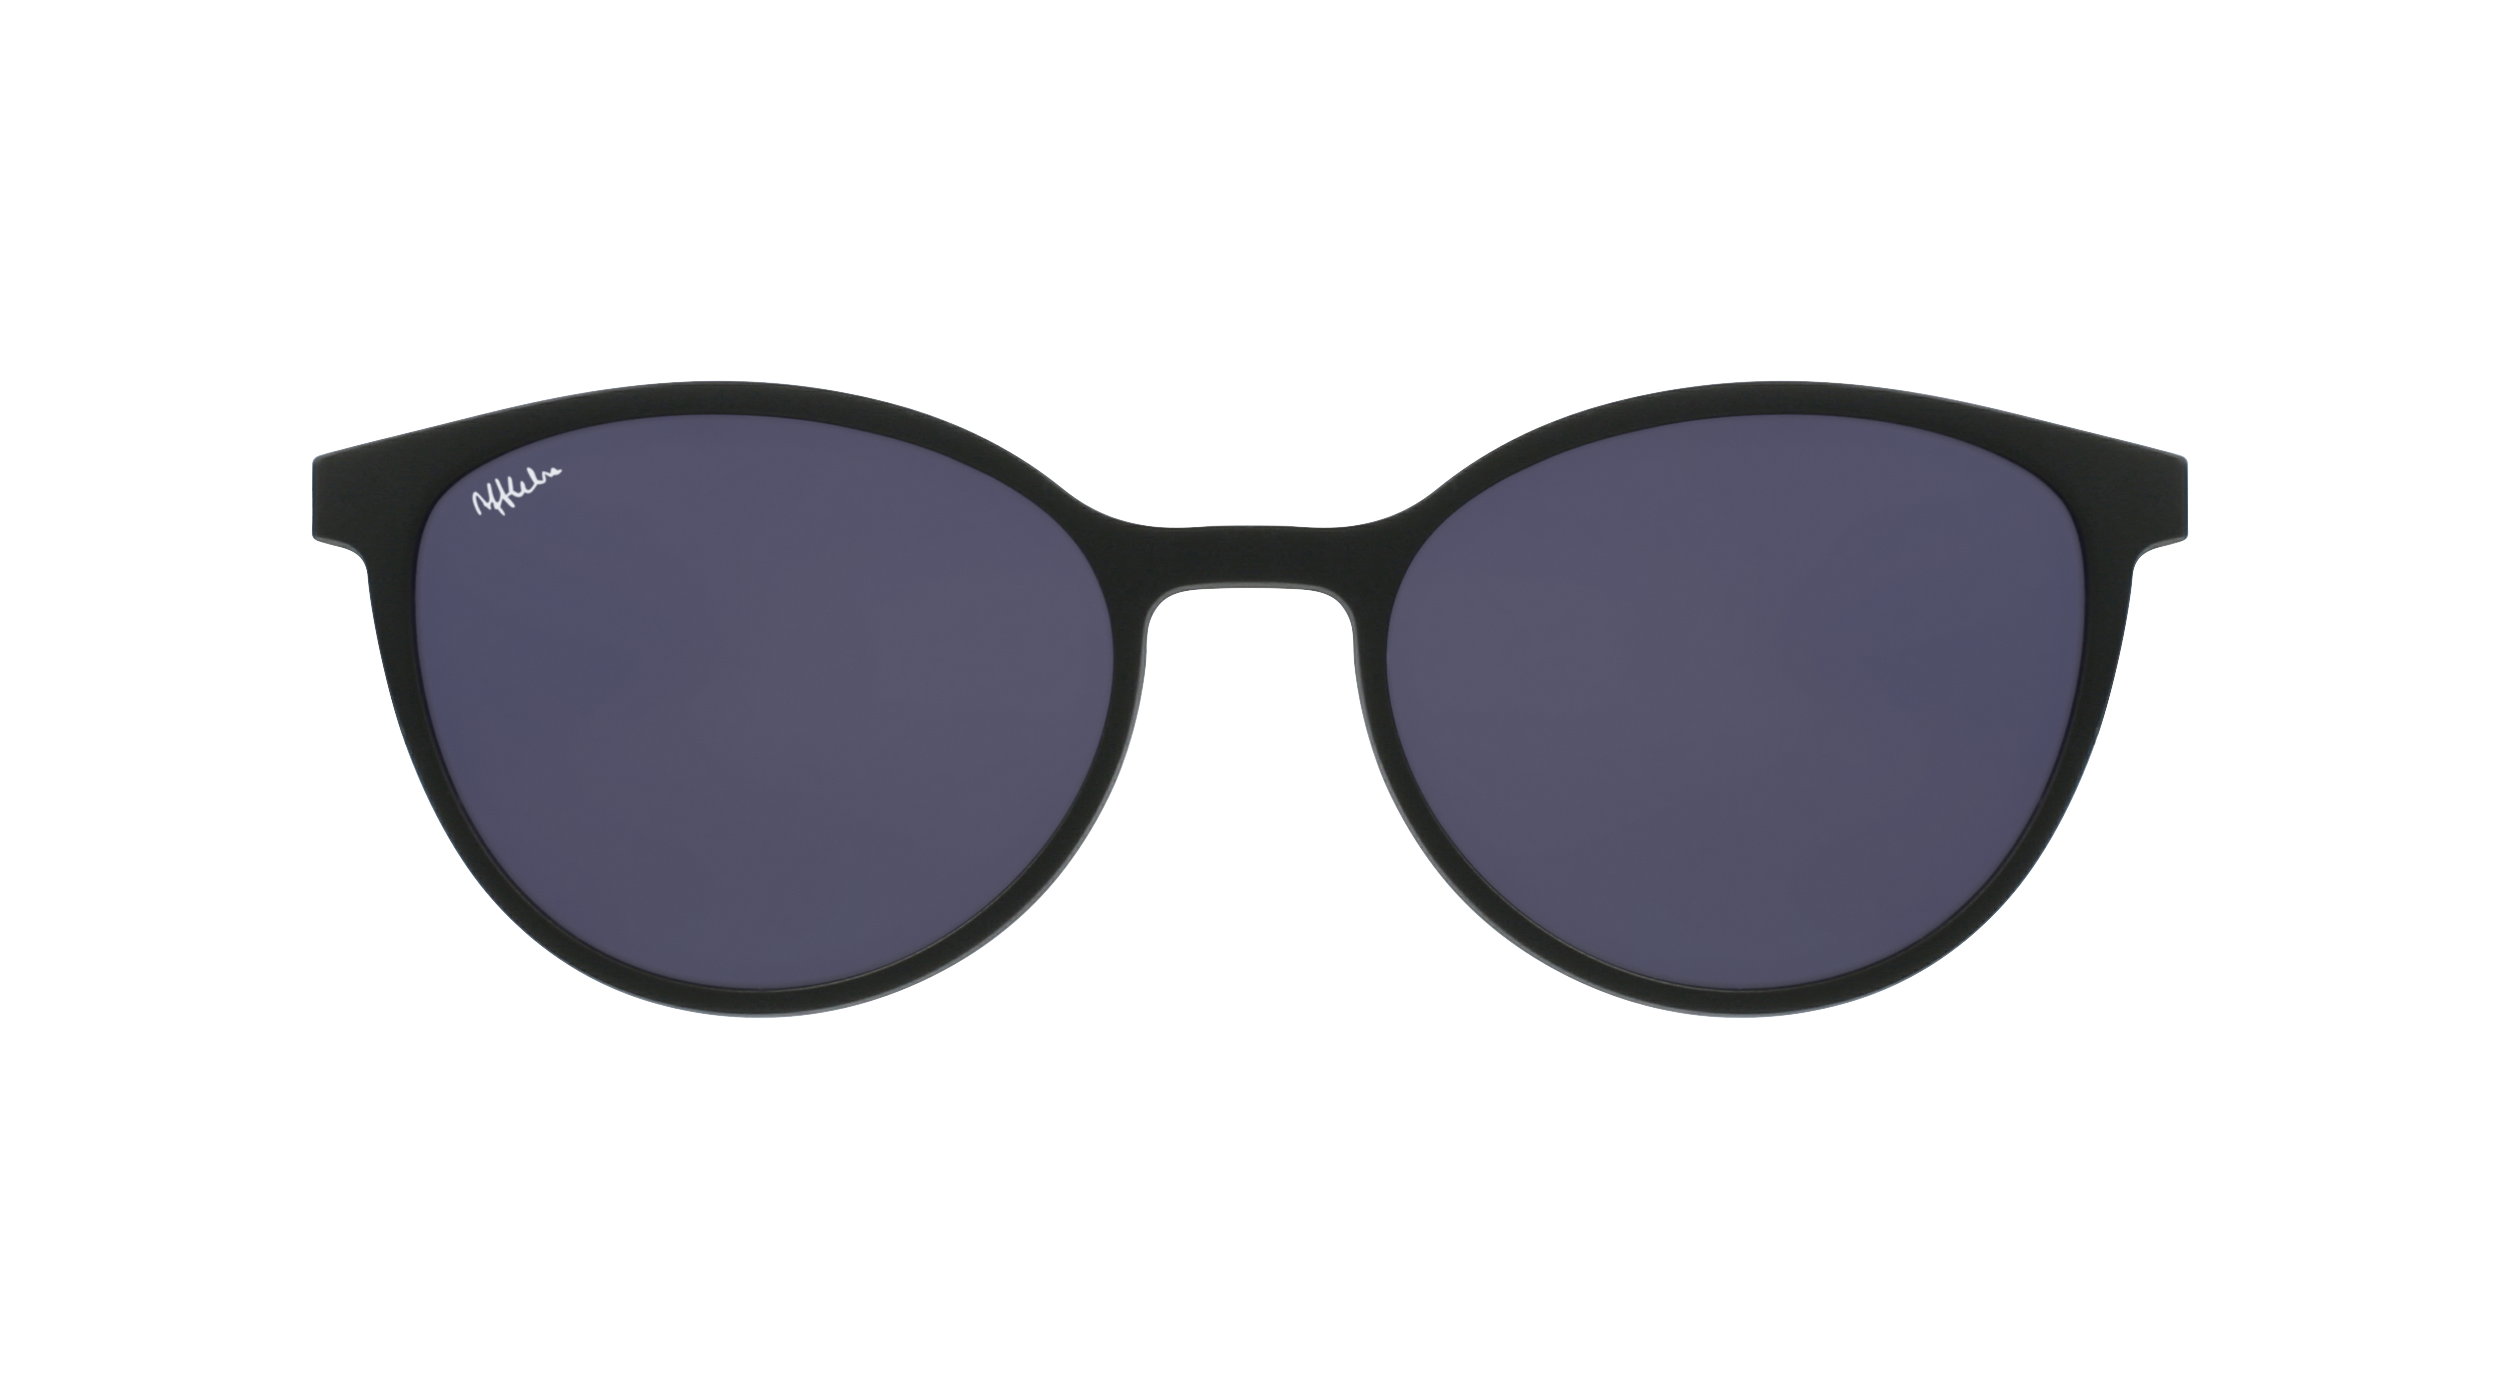 afflelou/france/products/smart_clip/clips_glasses/07630036458952.png